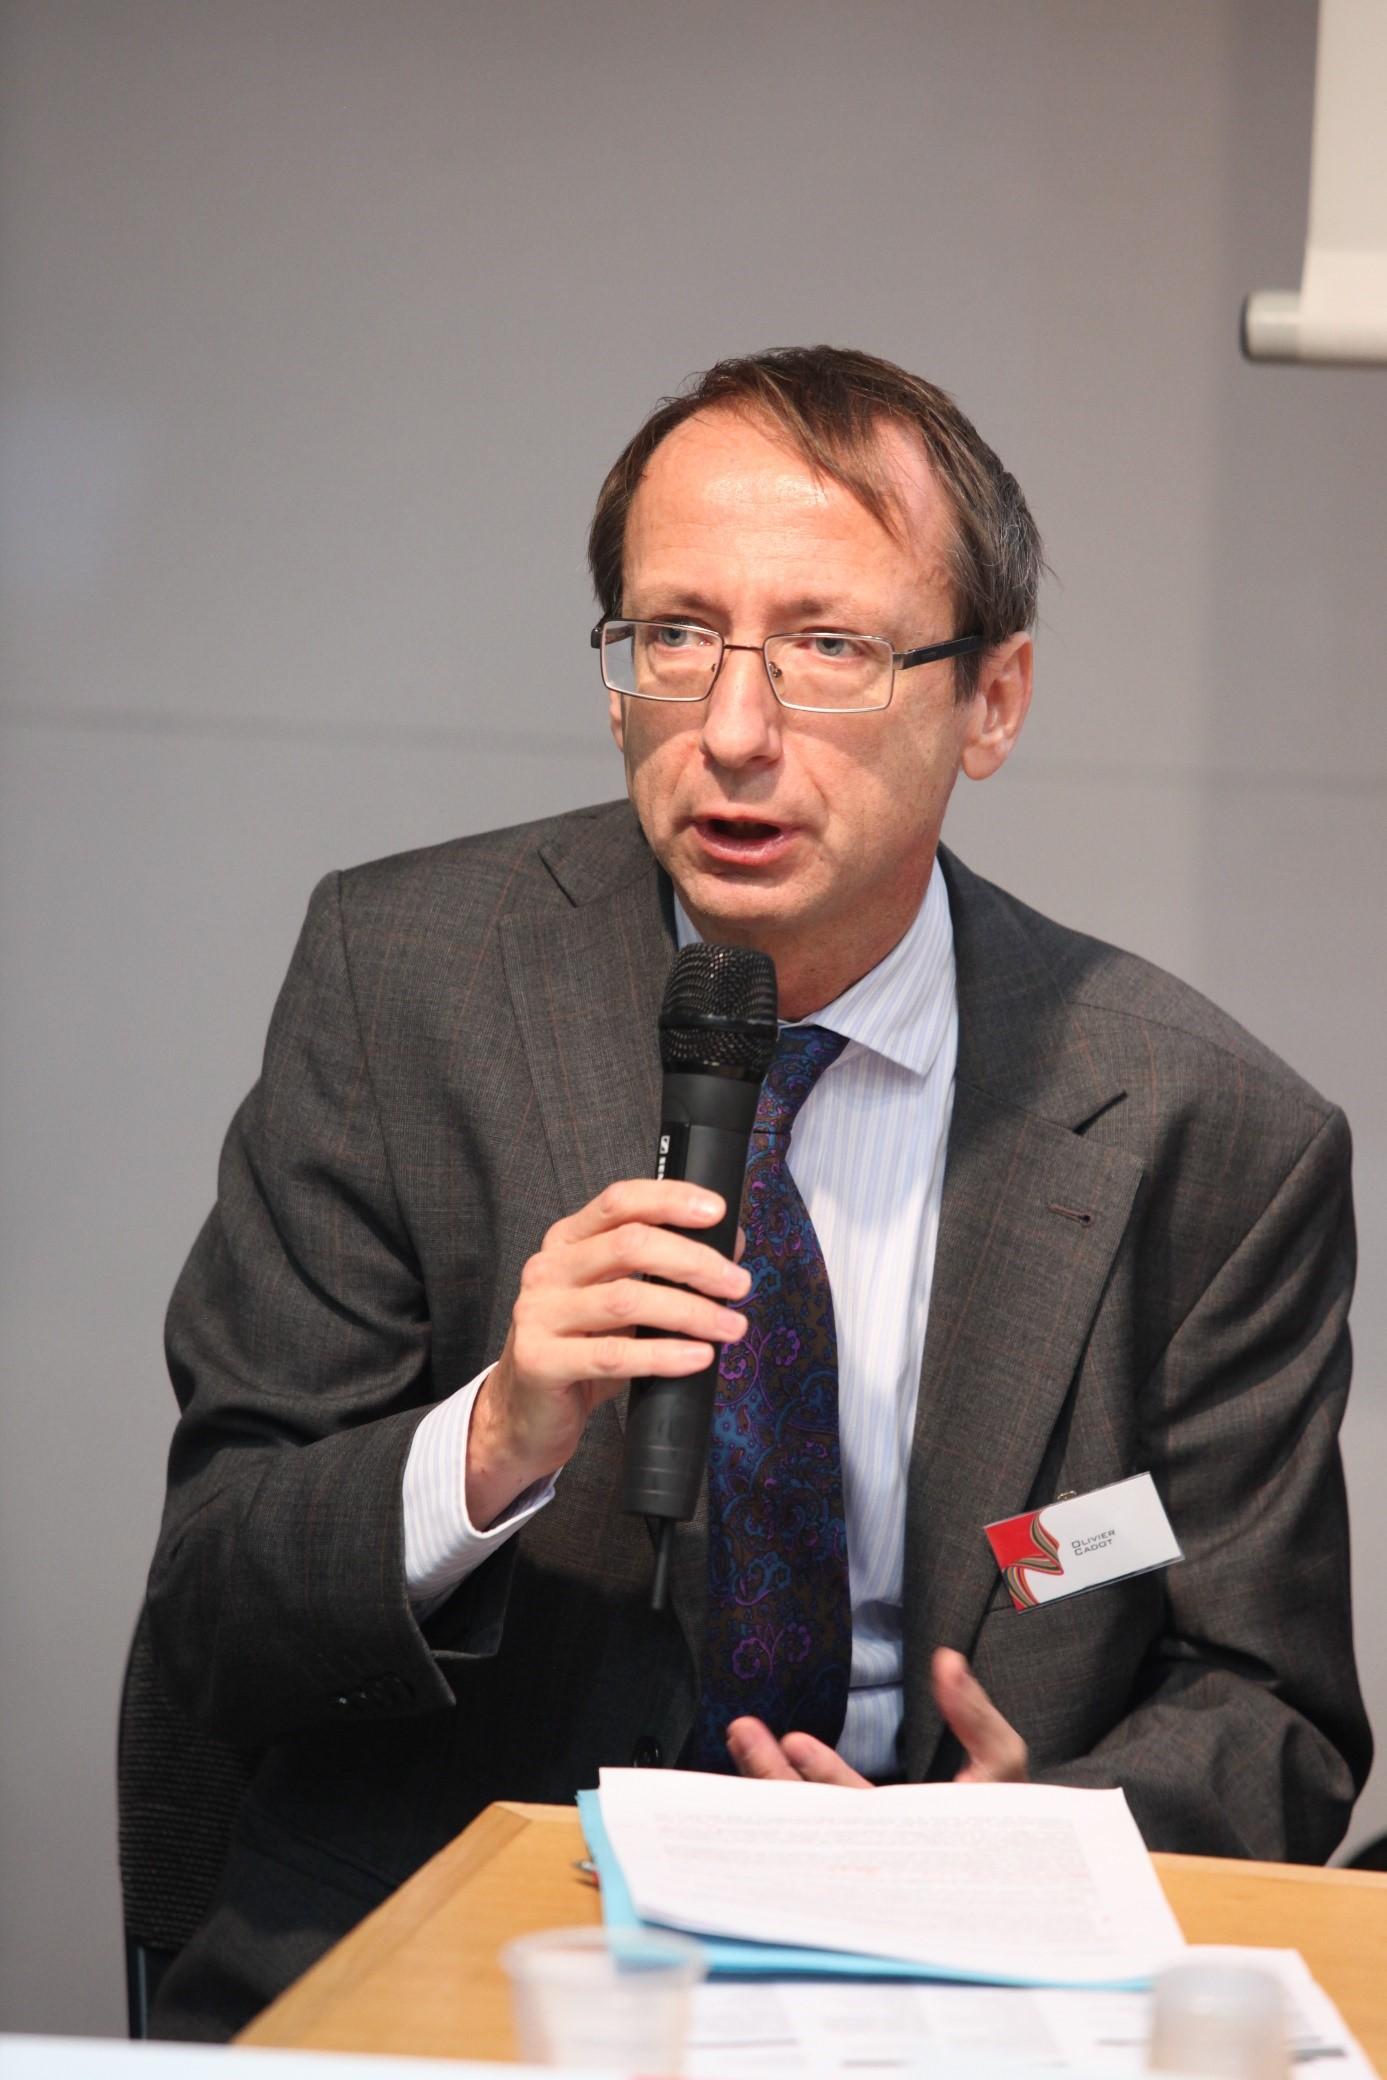 Professeur Olivier Cadot